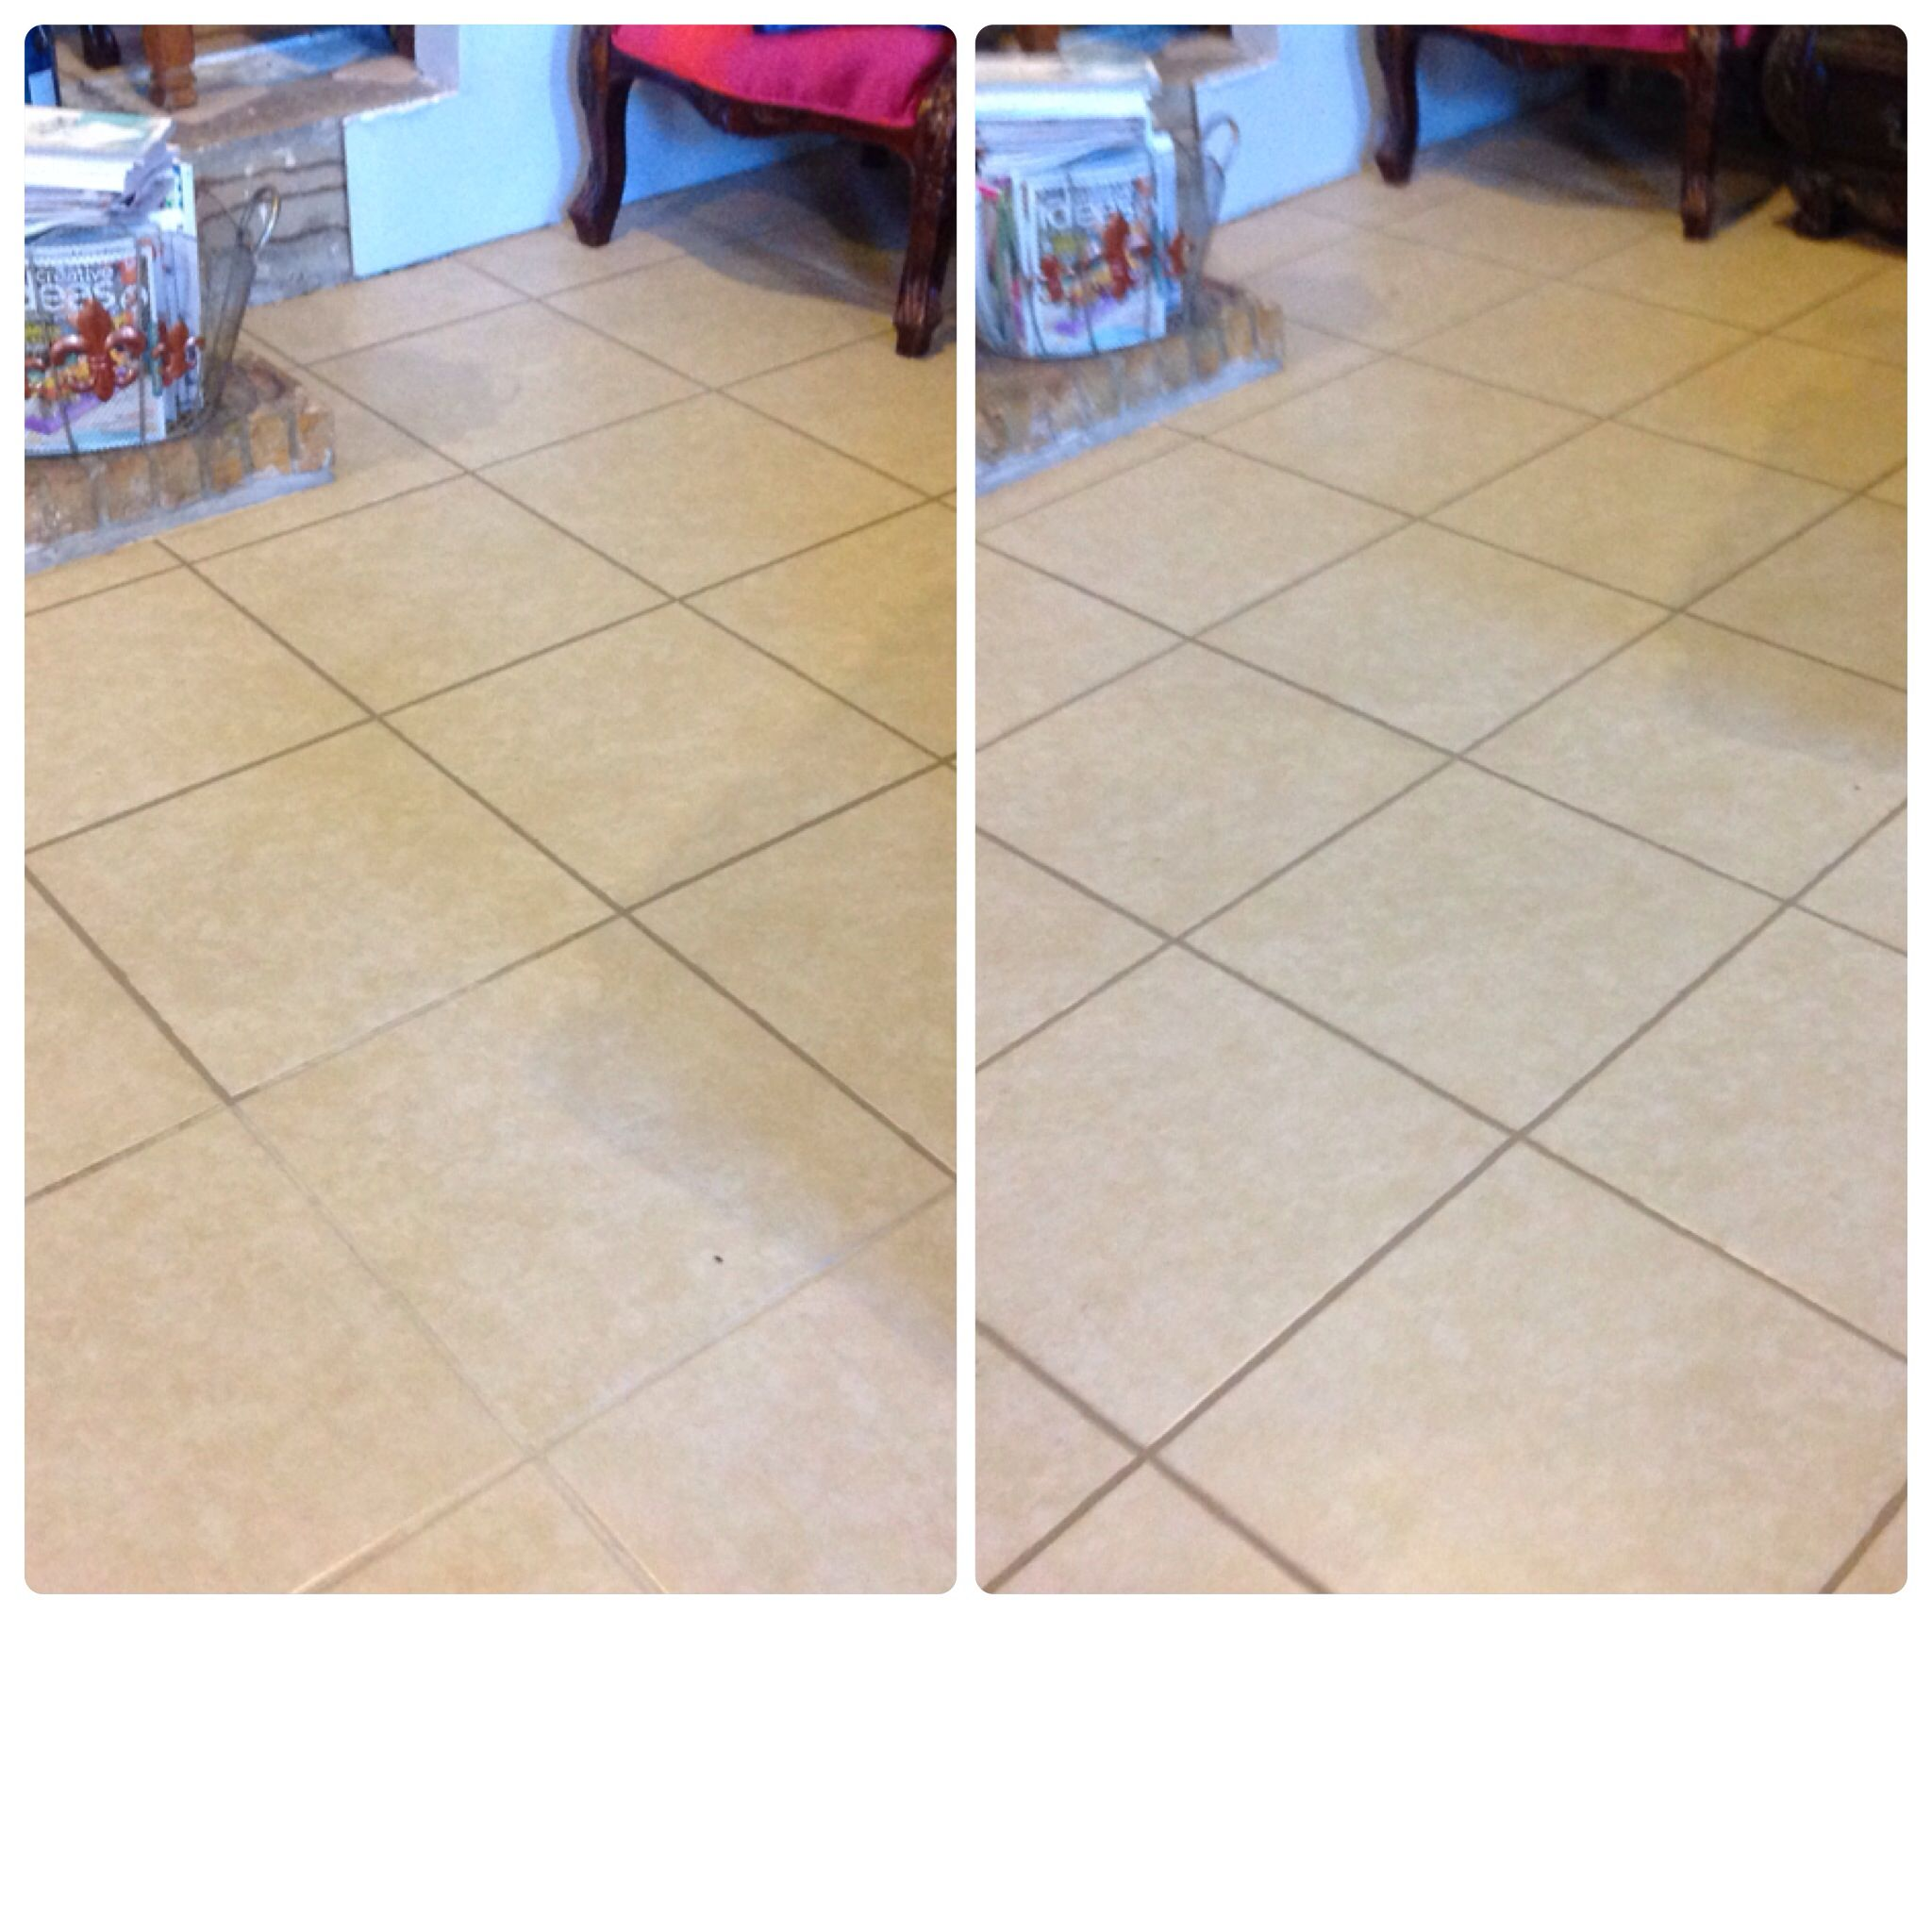 Renew Bathroom Tiles: Poly Blend Grout Renew